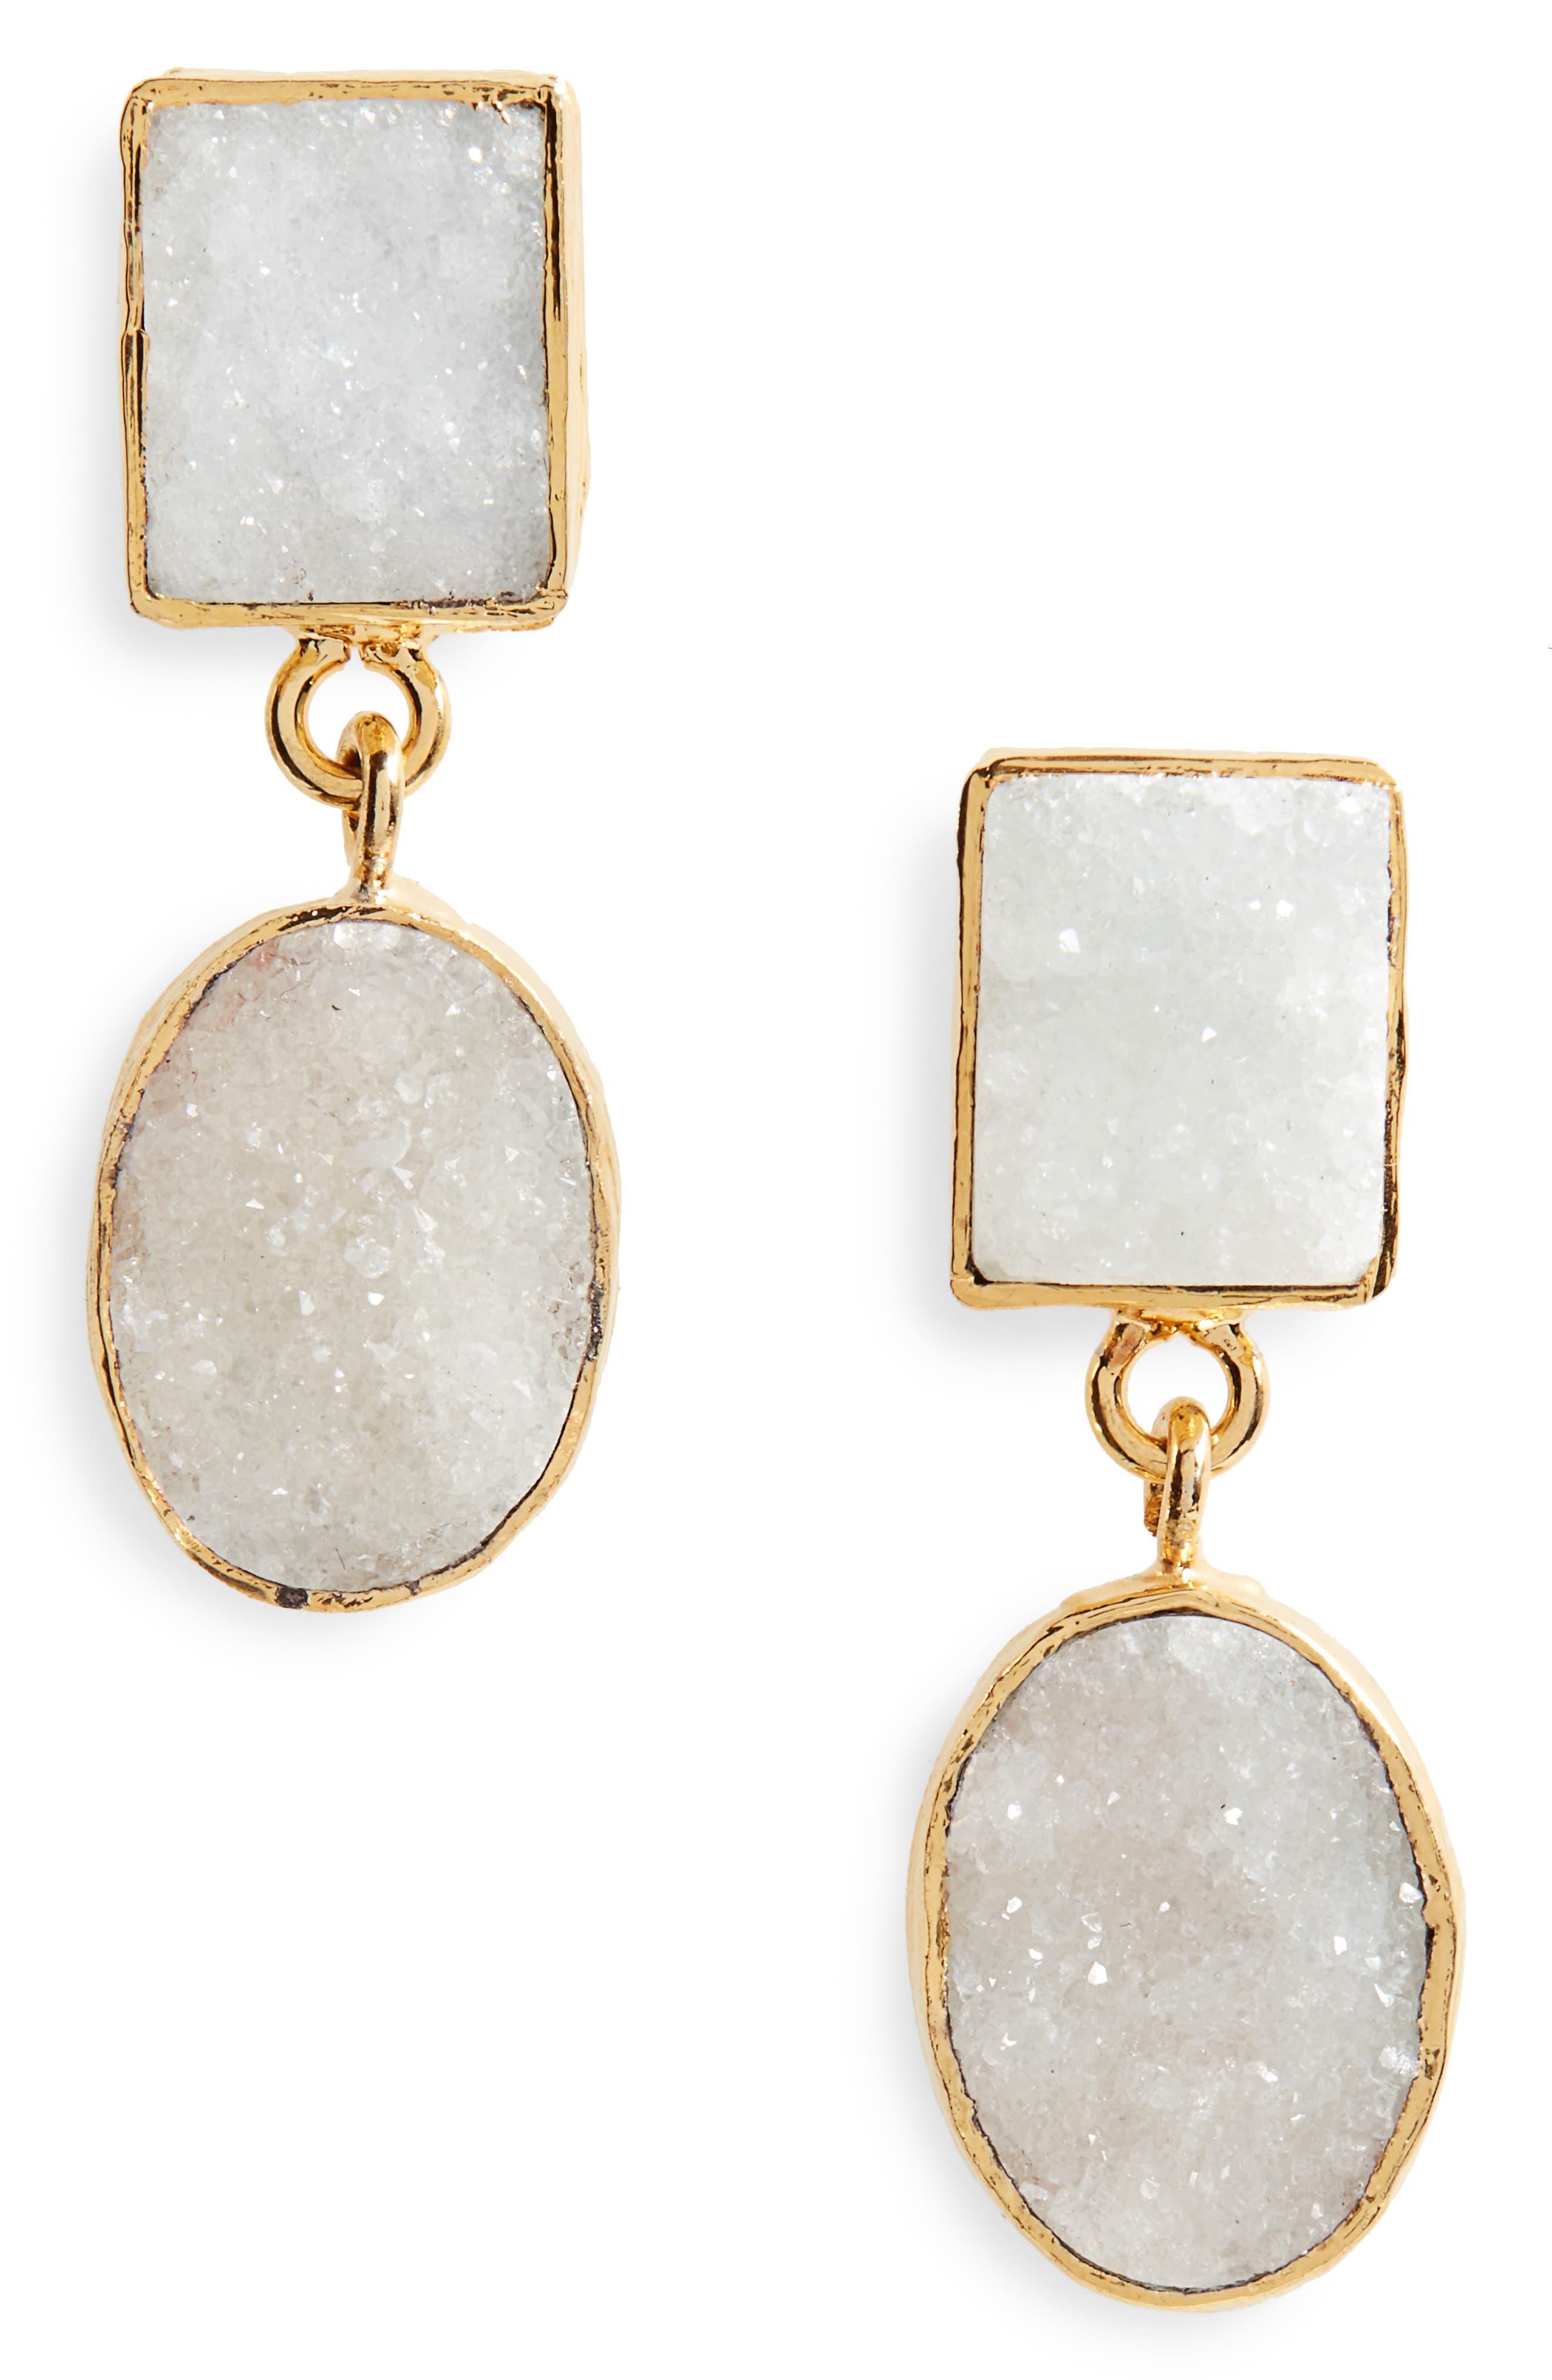 Double Drusy Drop Earrings,                             Main thumbnail 1, color,                             White